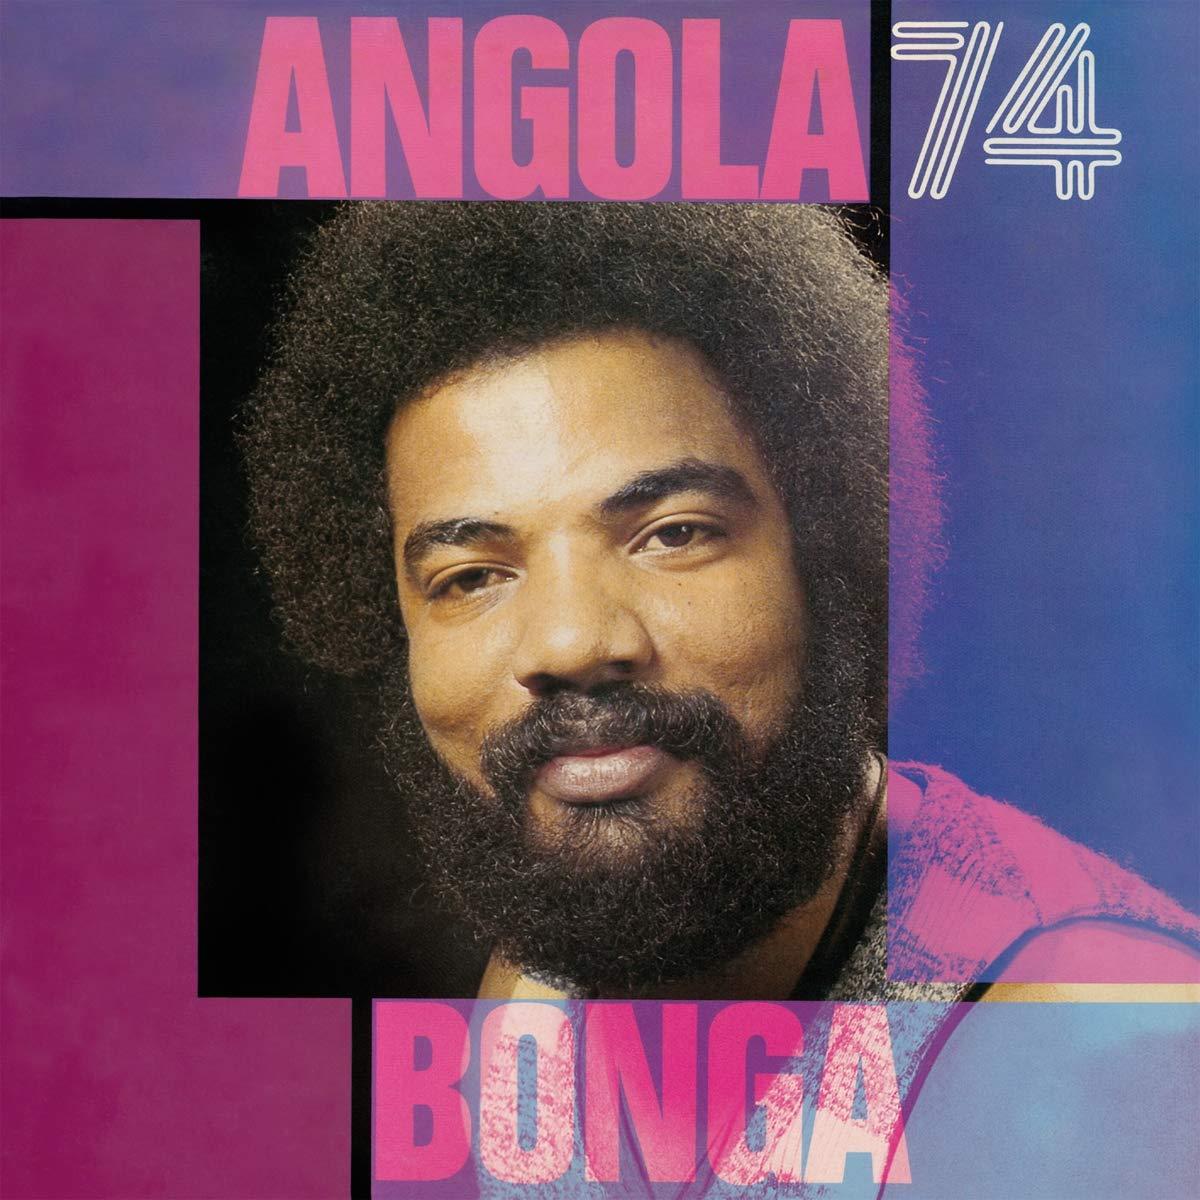 Bonga - Angola 74